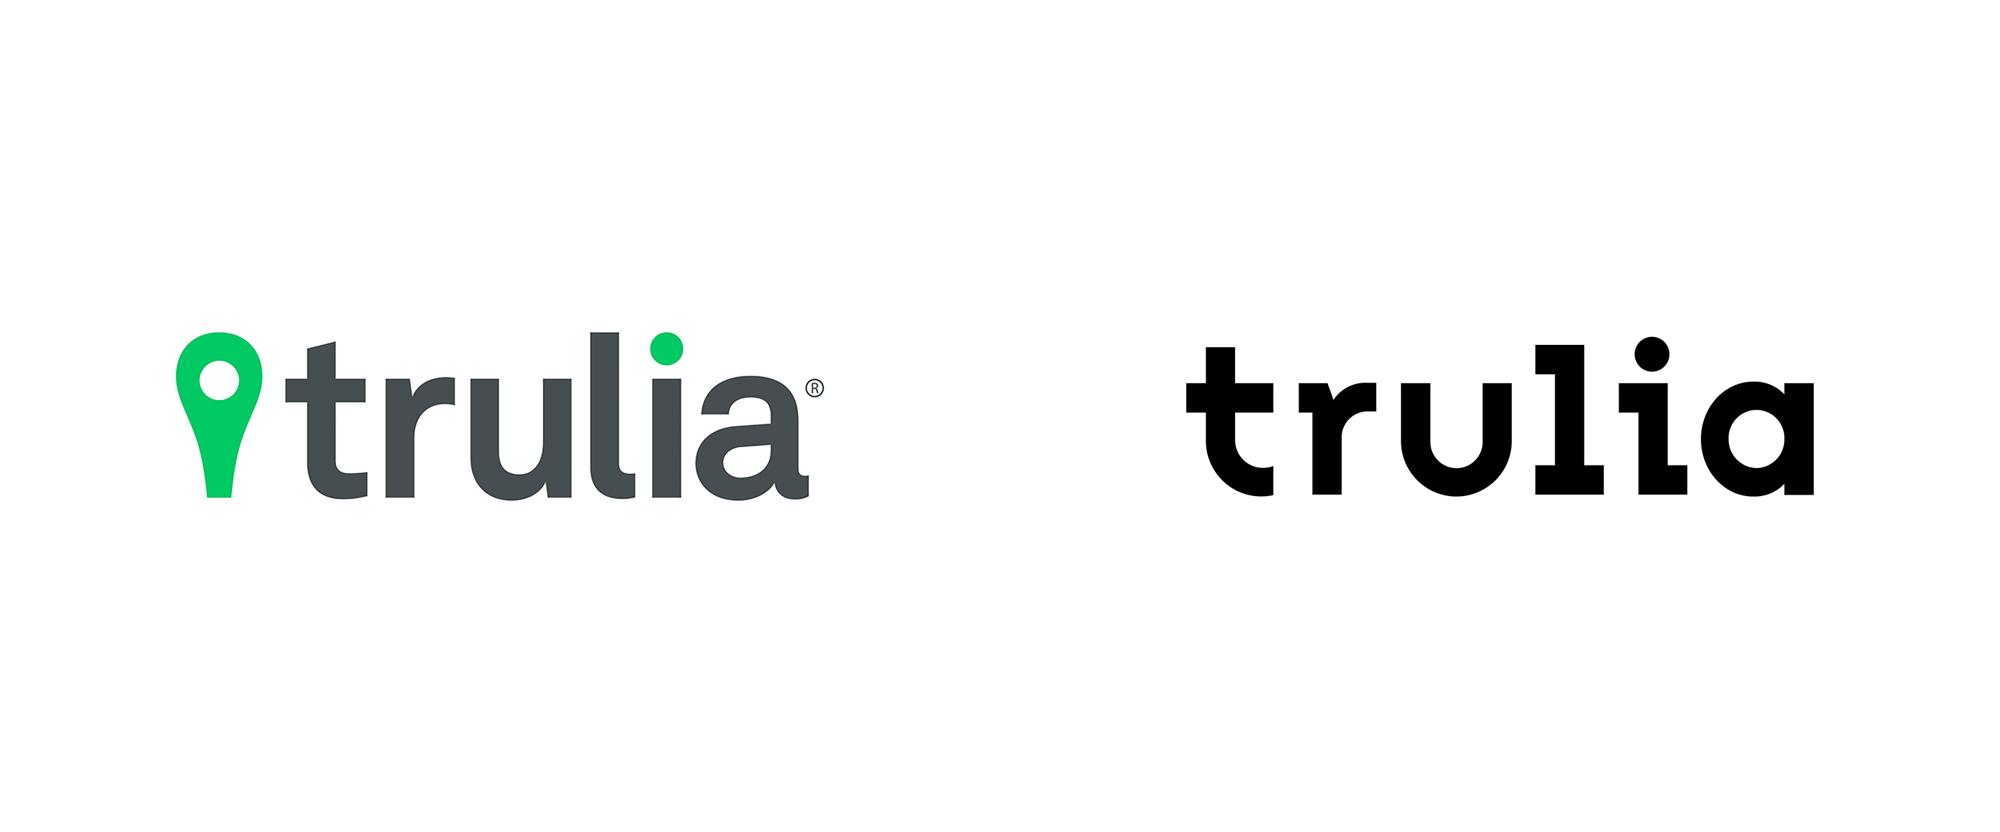 New Logo And Identity For Trulia By Design Studio Word Mark Logo Identity Logo Marker Icon